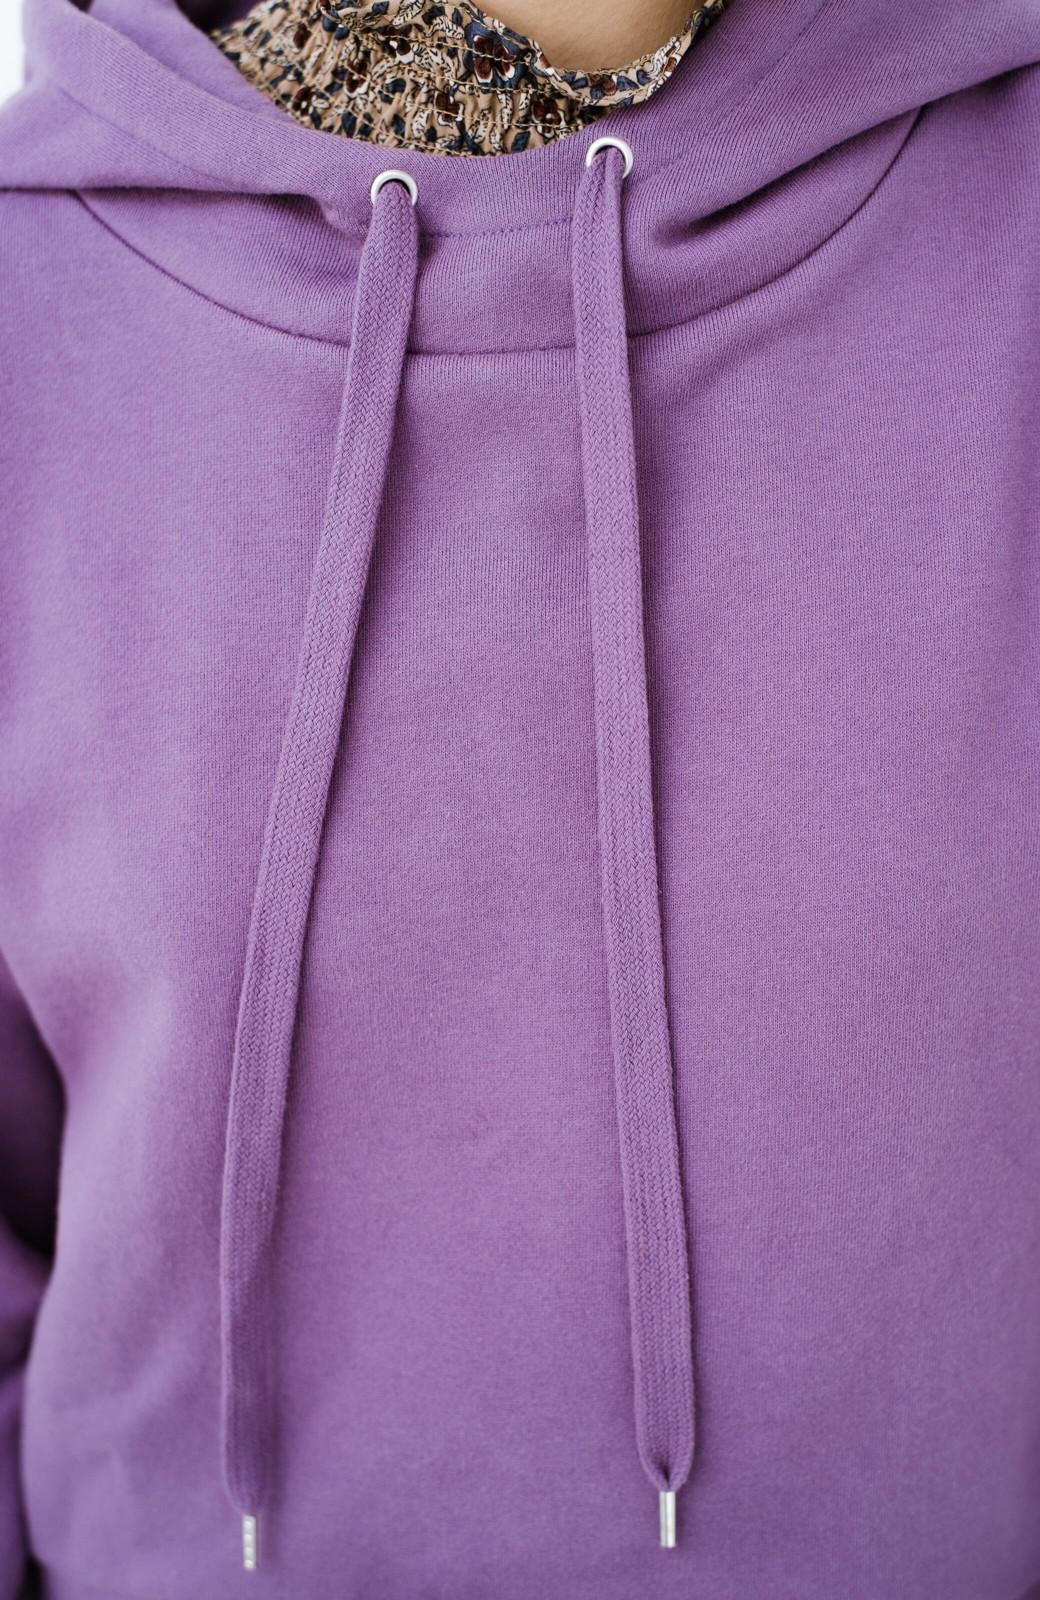 haco! PBPオーガニックコットン 短め丈でバランスよく着られる裏起毛パーカー <パープル>の商品写真6